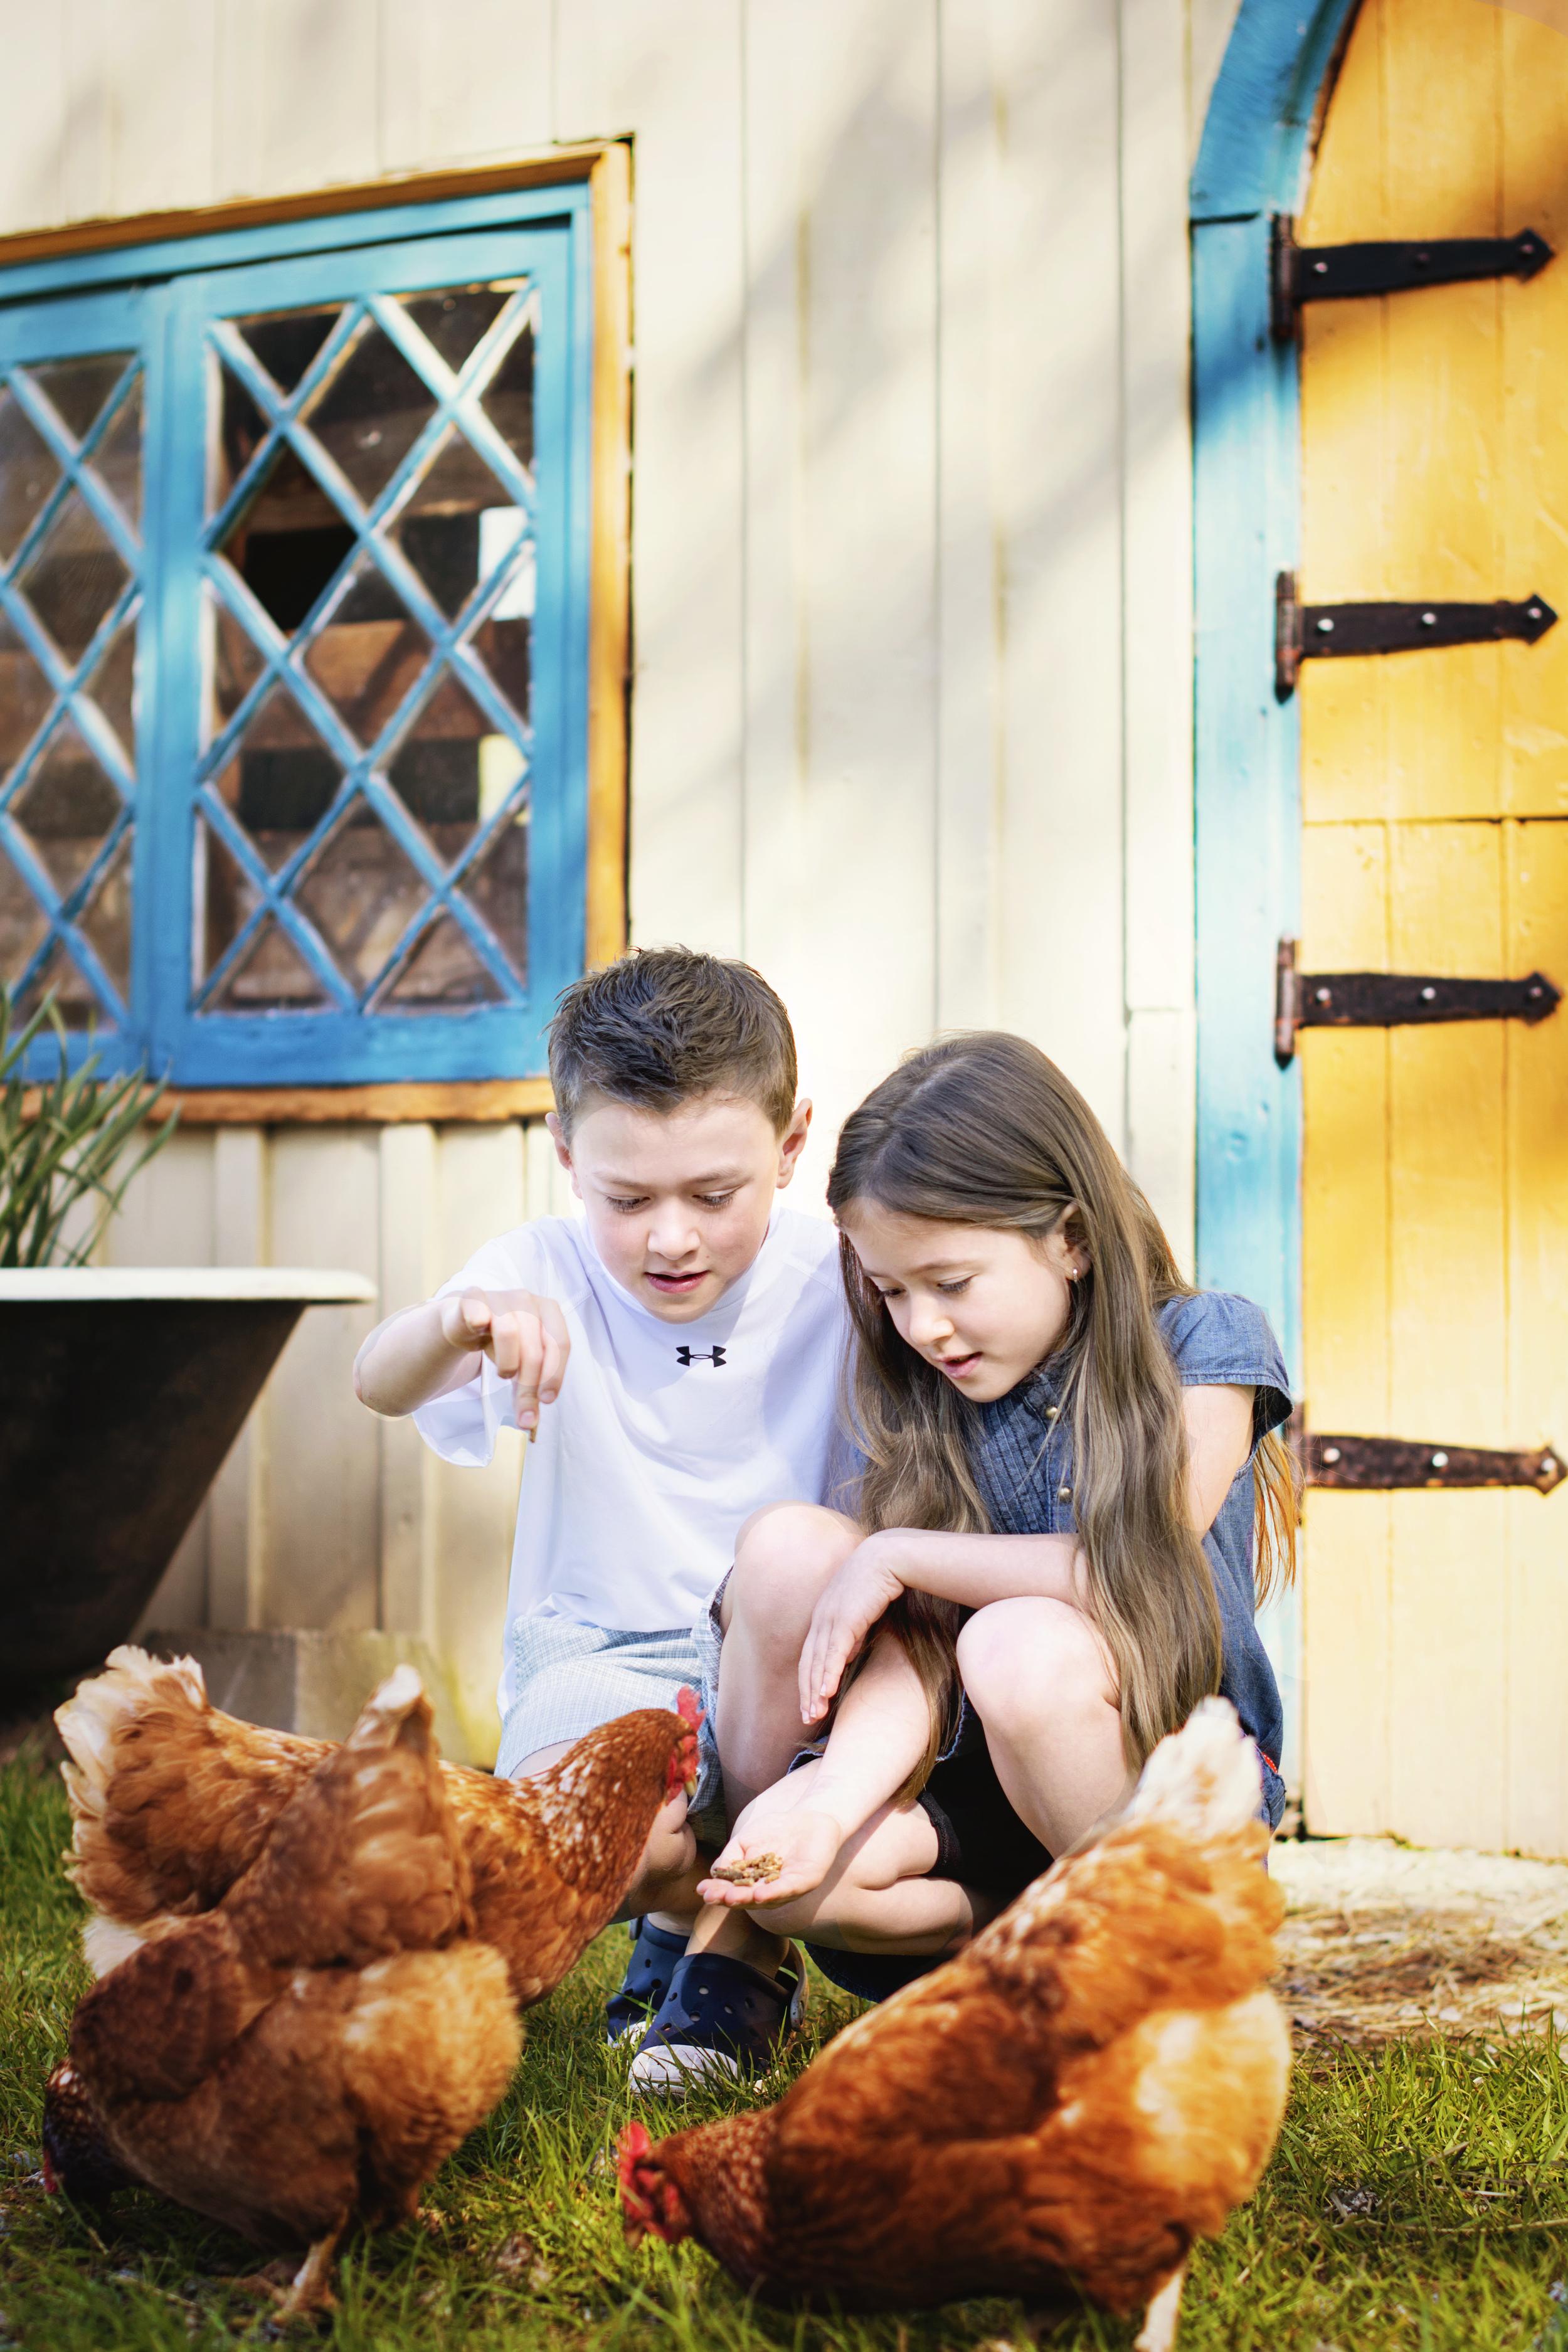 Feeding some chickens